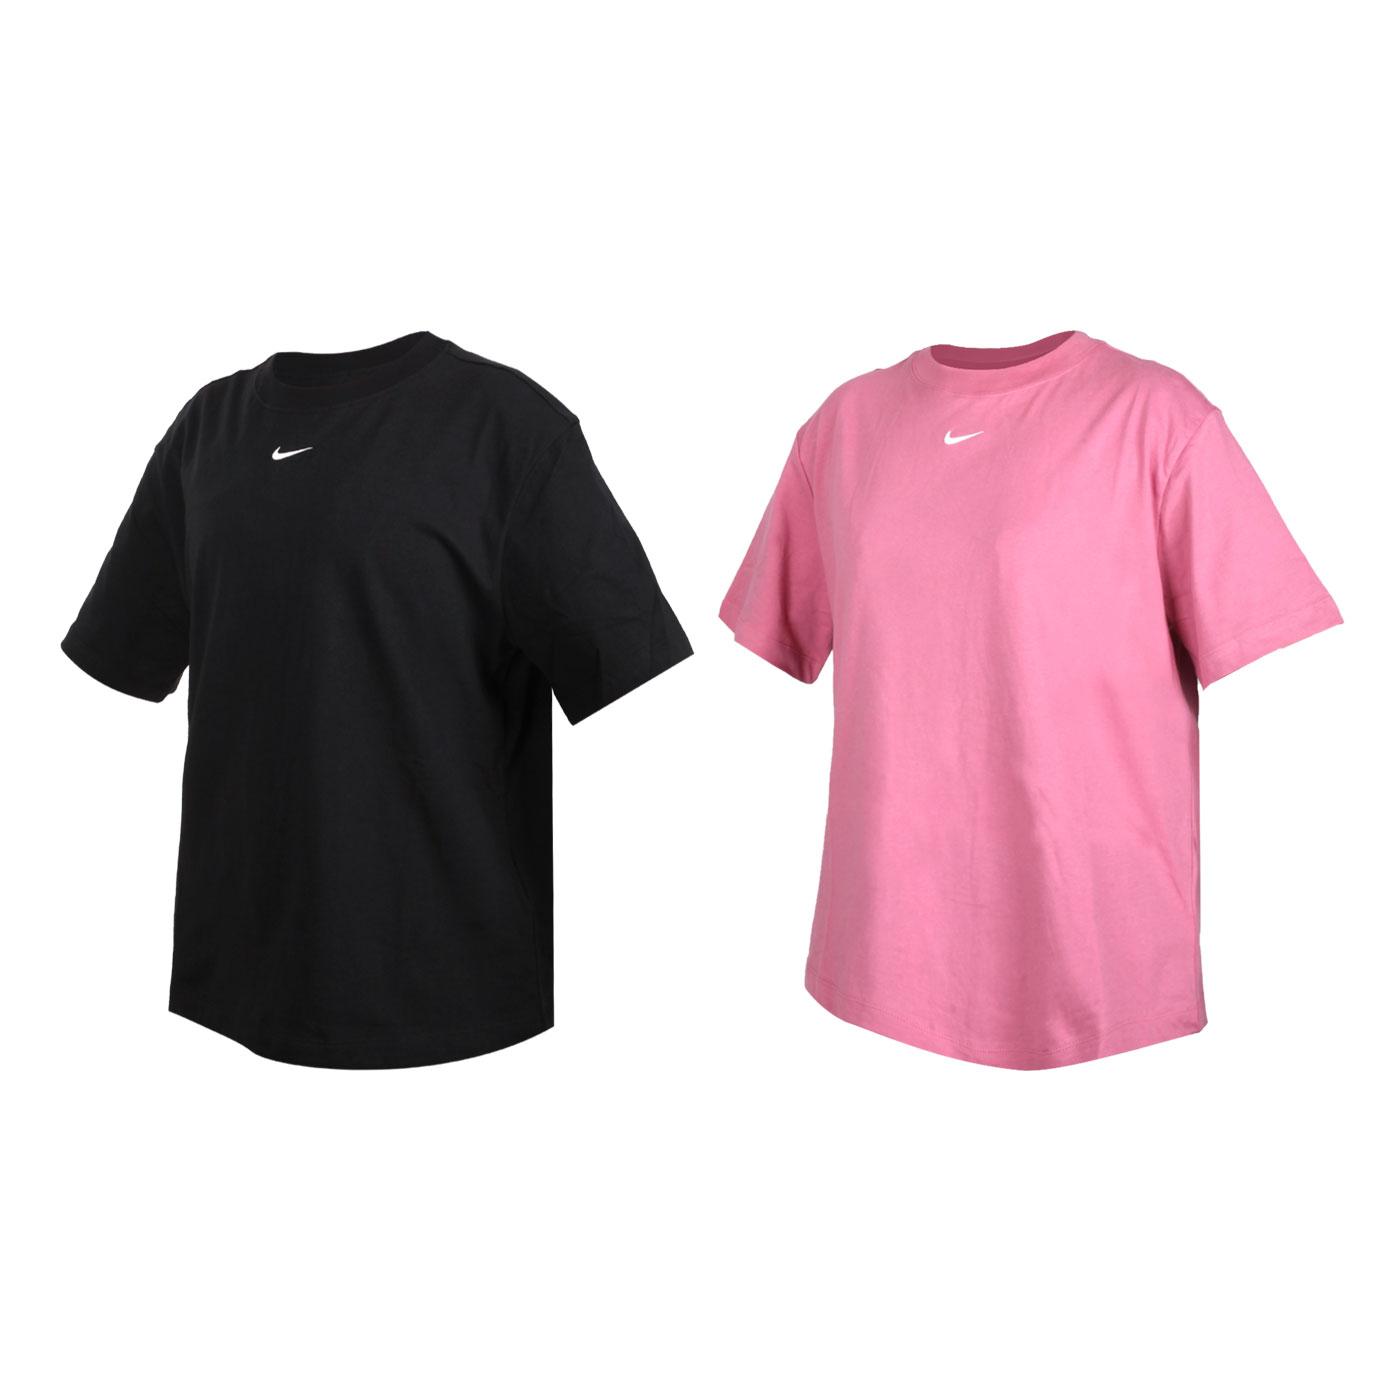 NIKE 女款短袖T恤 CT2588-010